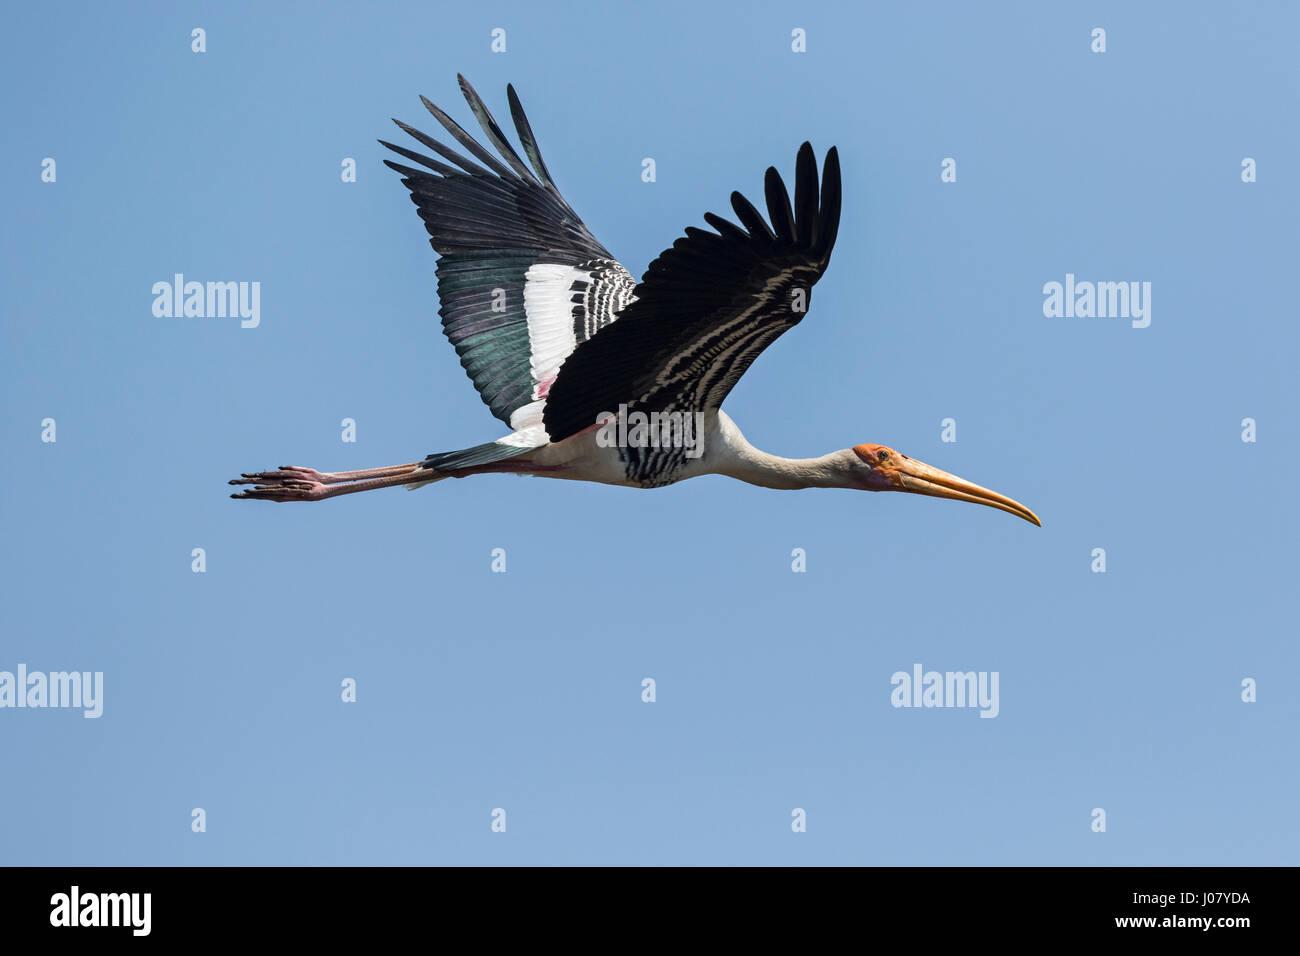 Painted Stork (Mycteria leucocephala) in flight, Prek Toal, Tonle Sap, Cambodia - Stock Image